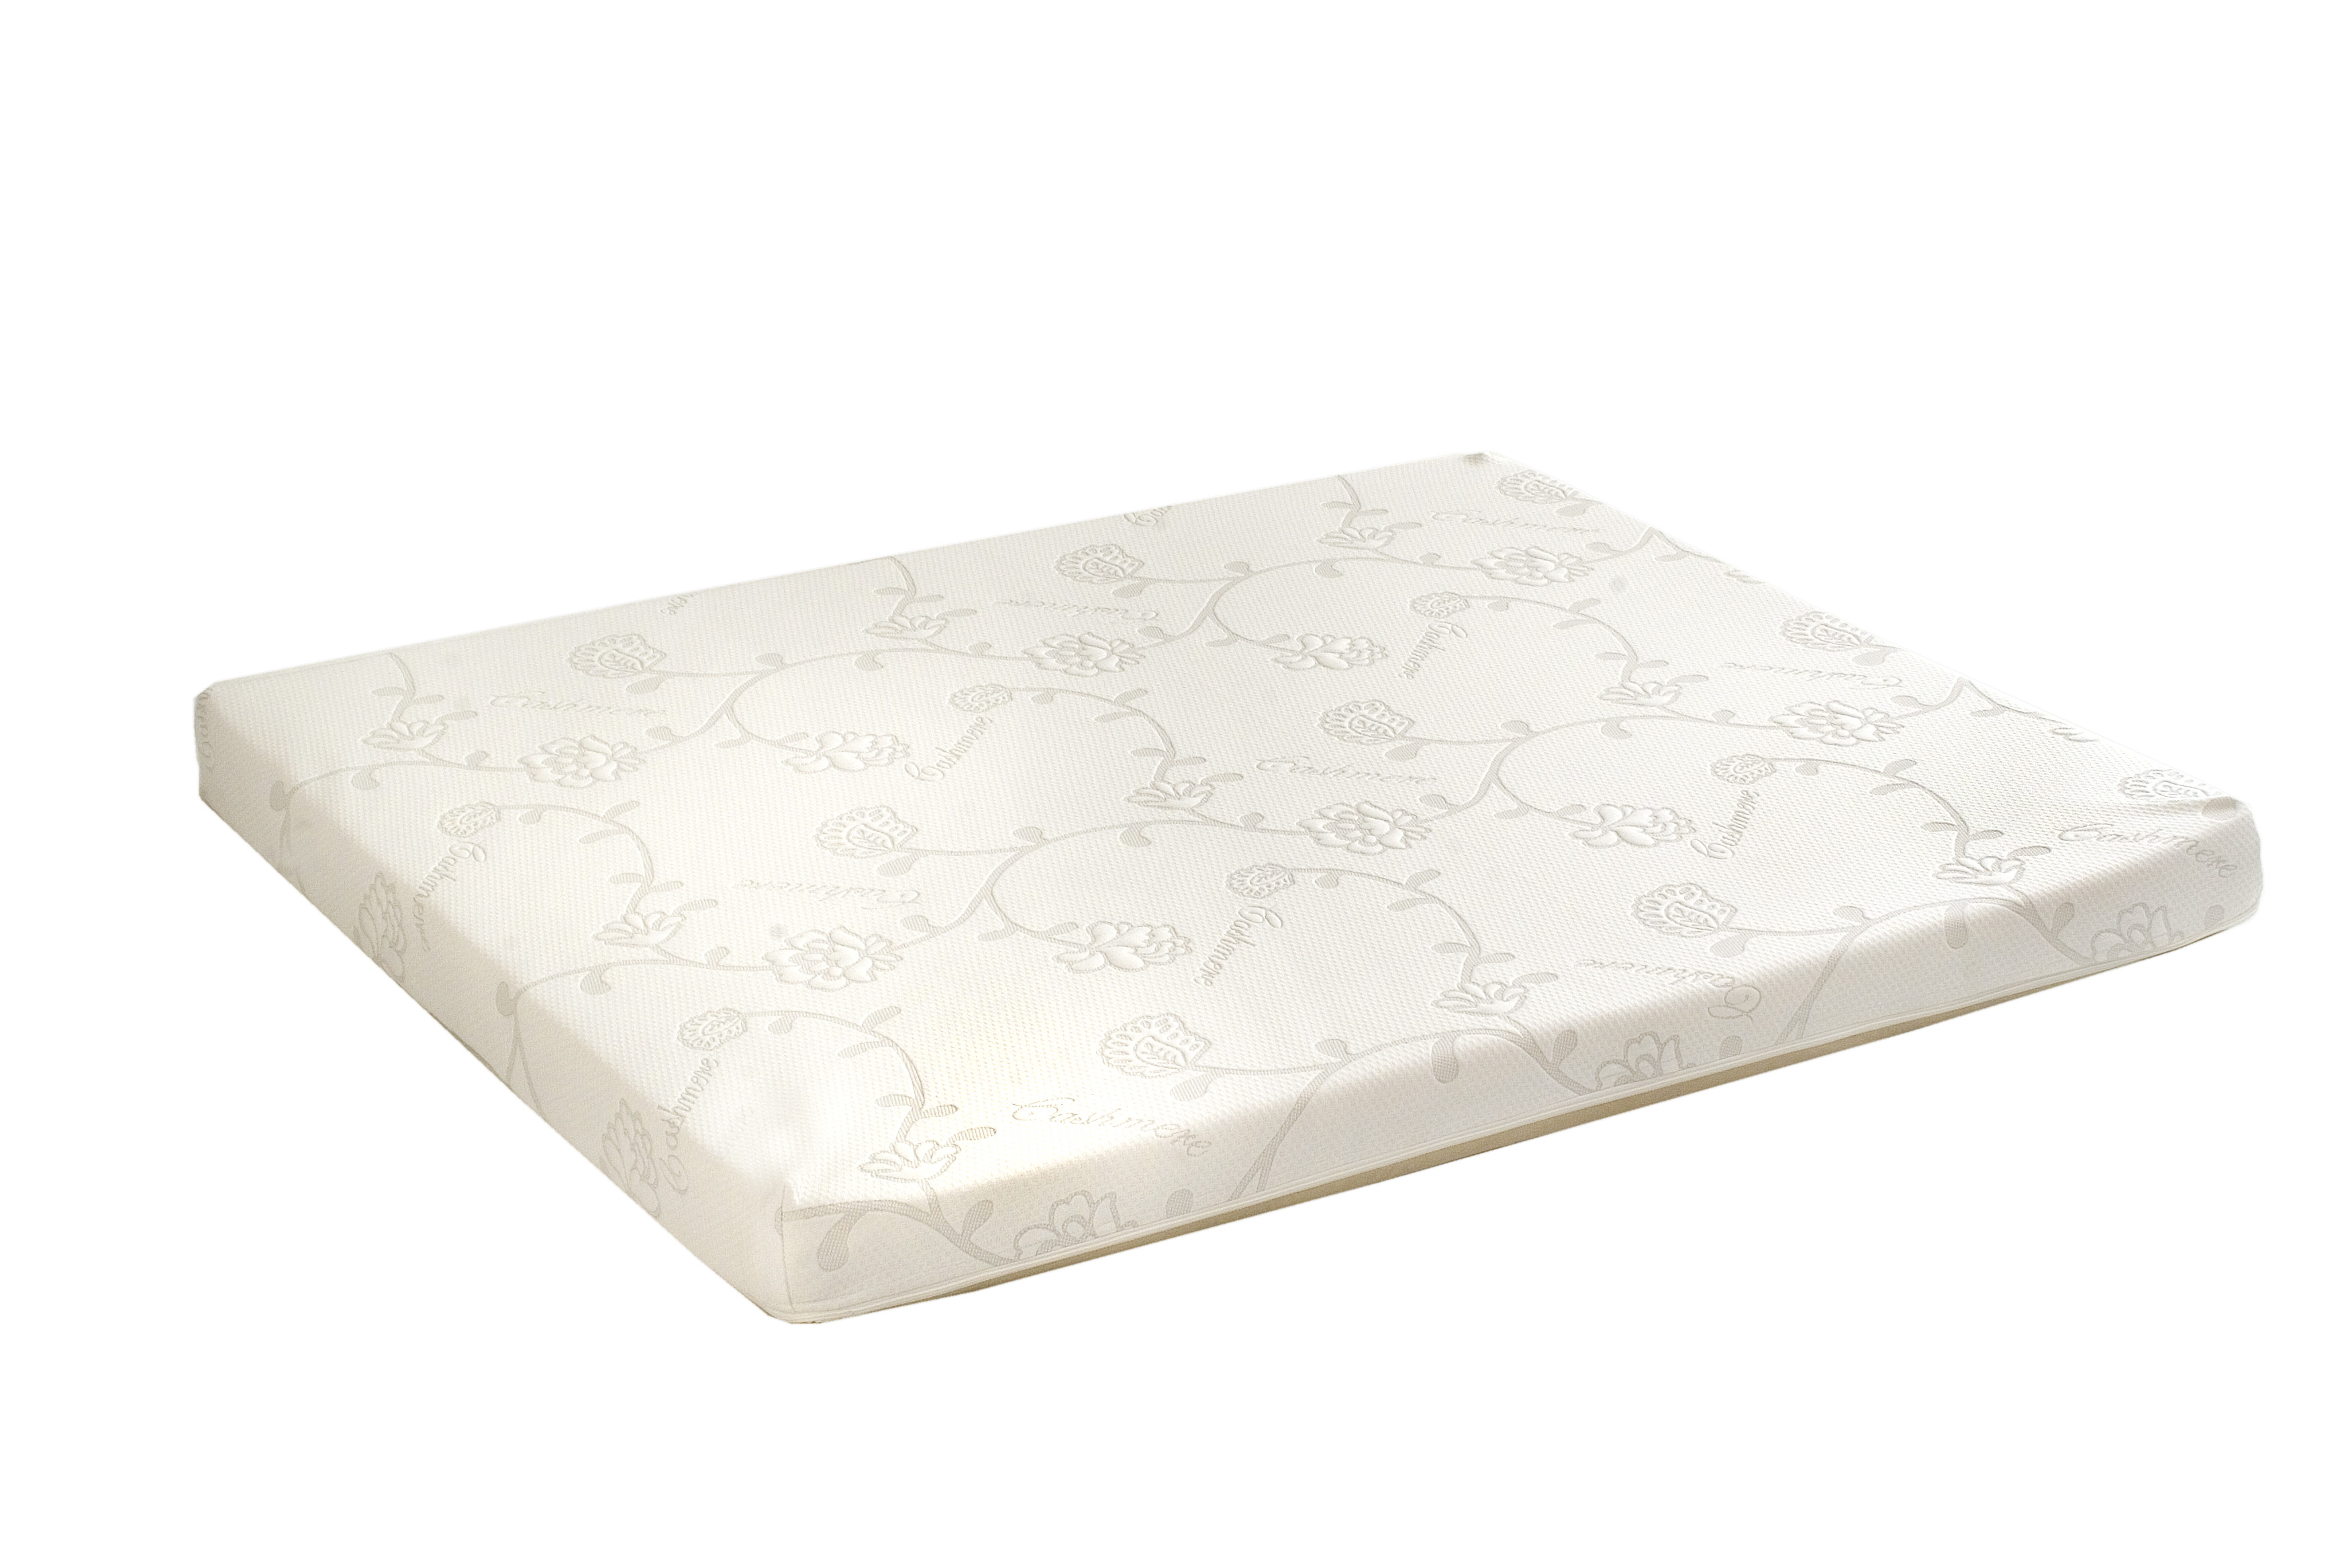 polyurethane sofa repair fairmont harveys innerspace luxury products 4 5 inch memory foam